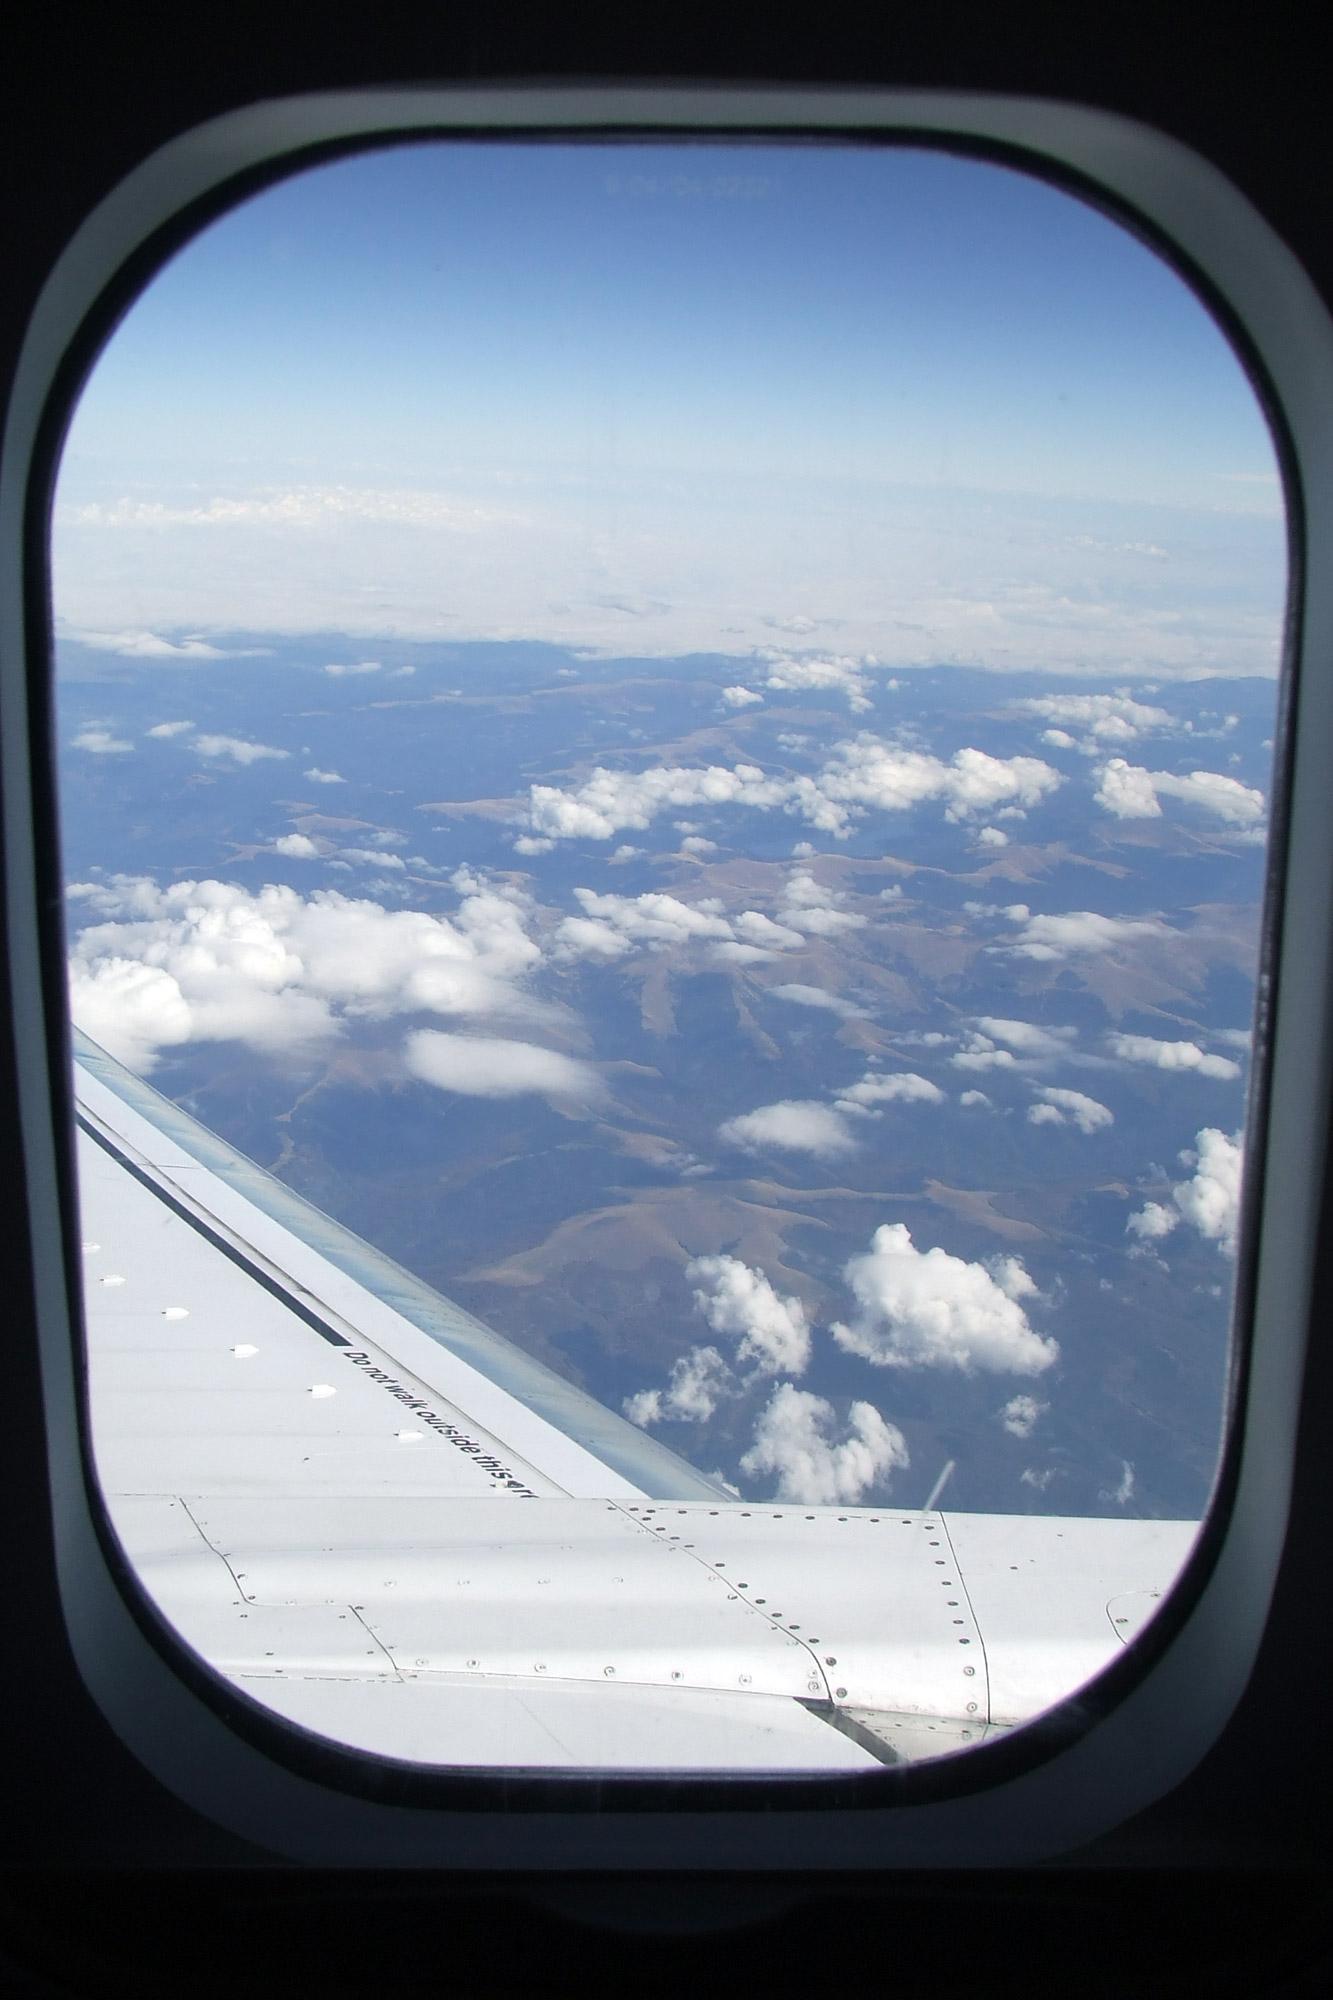 View-trough-airplane-window-in-flight1654.jpg